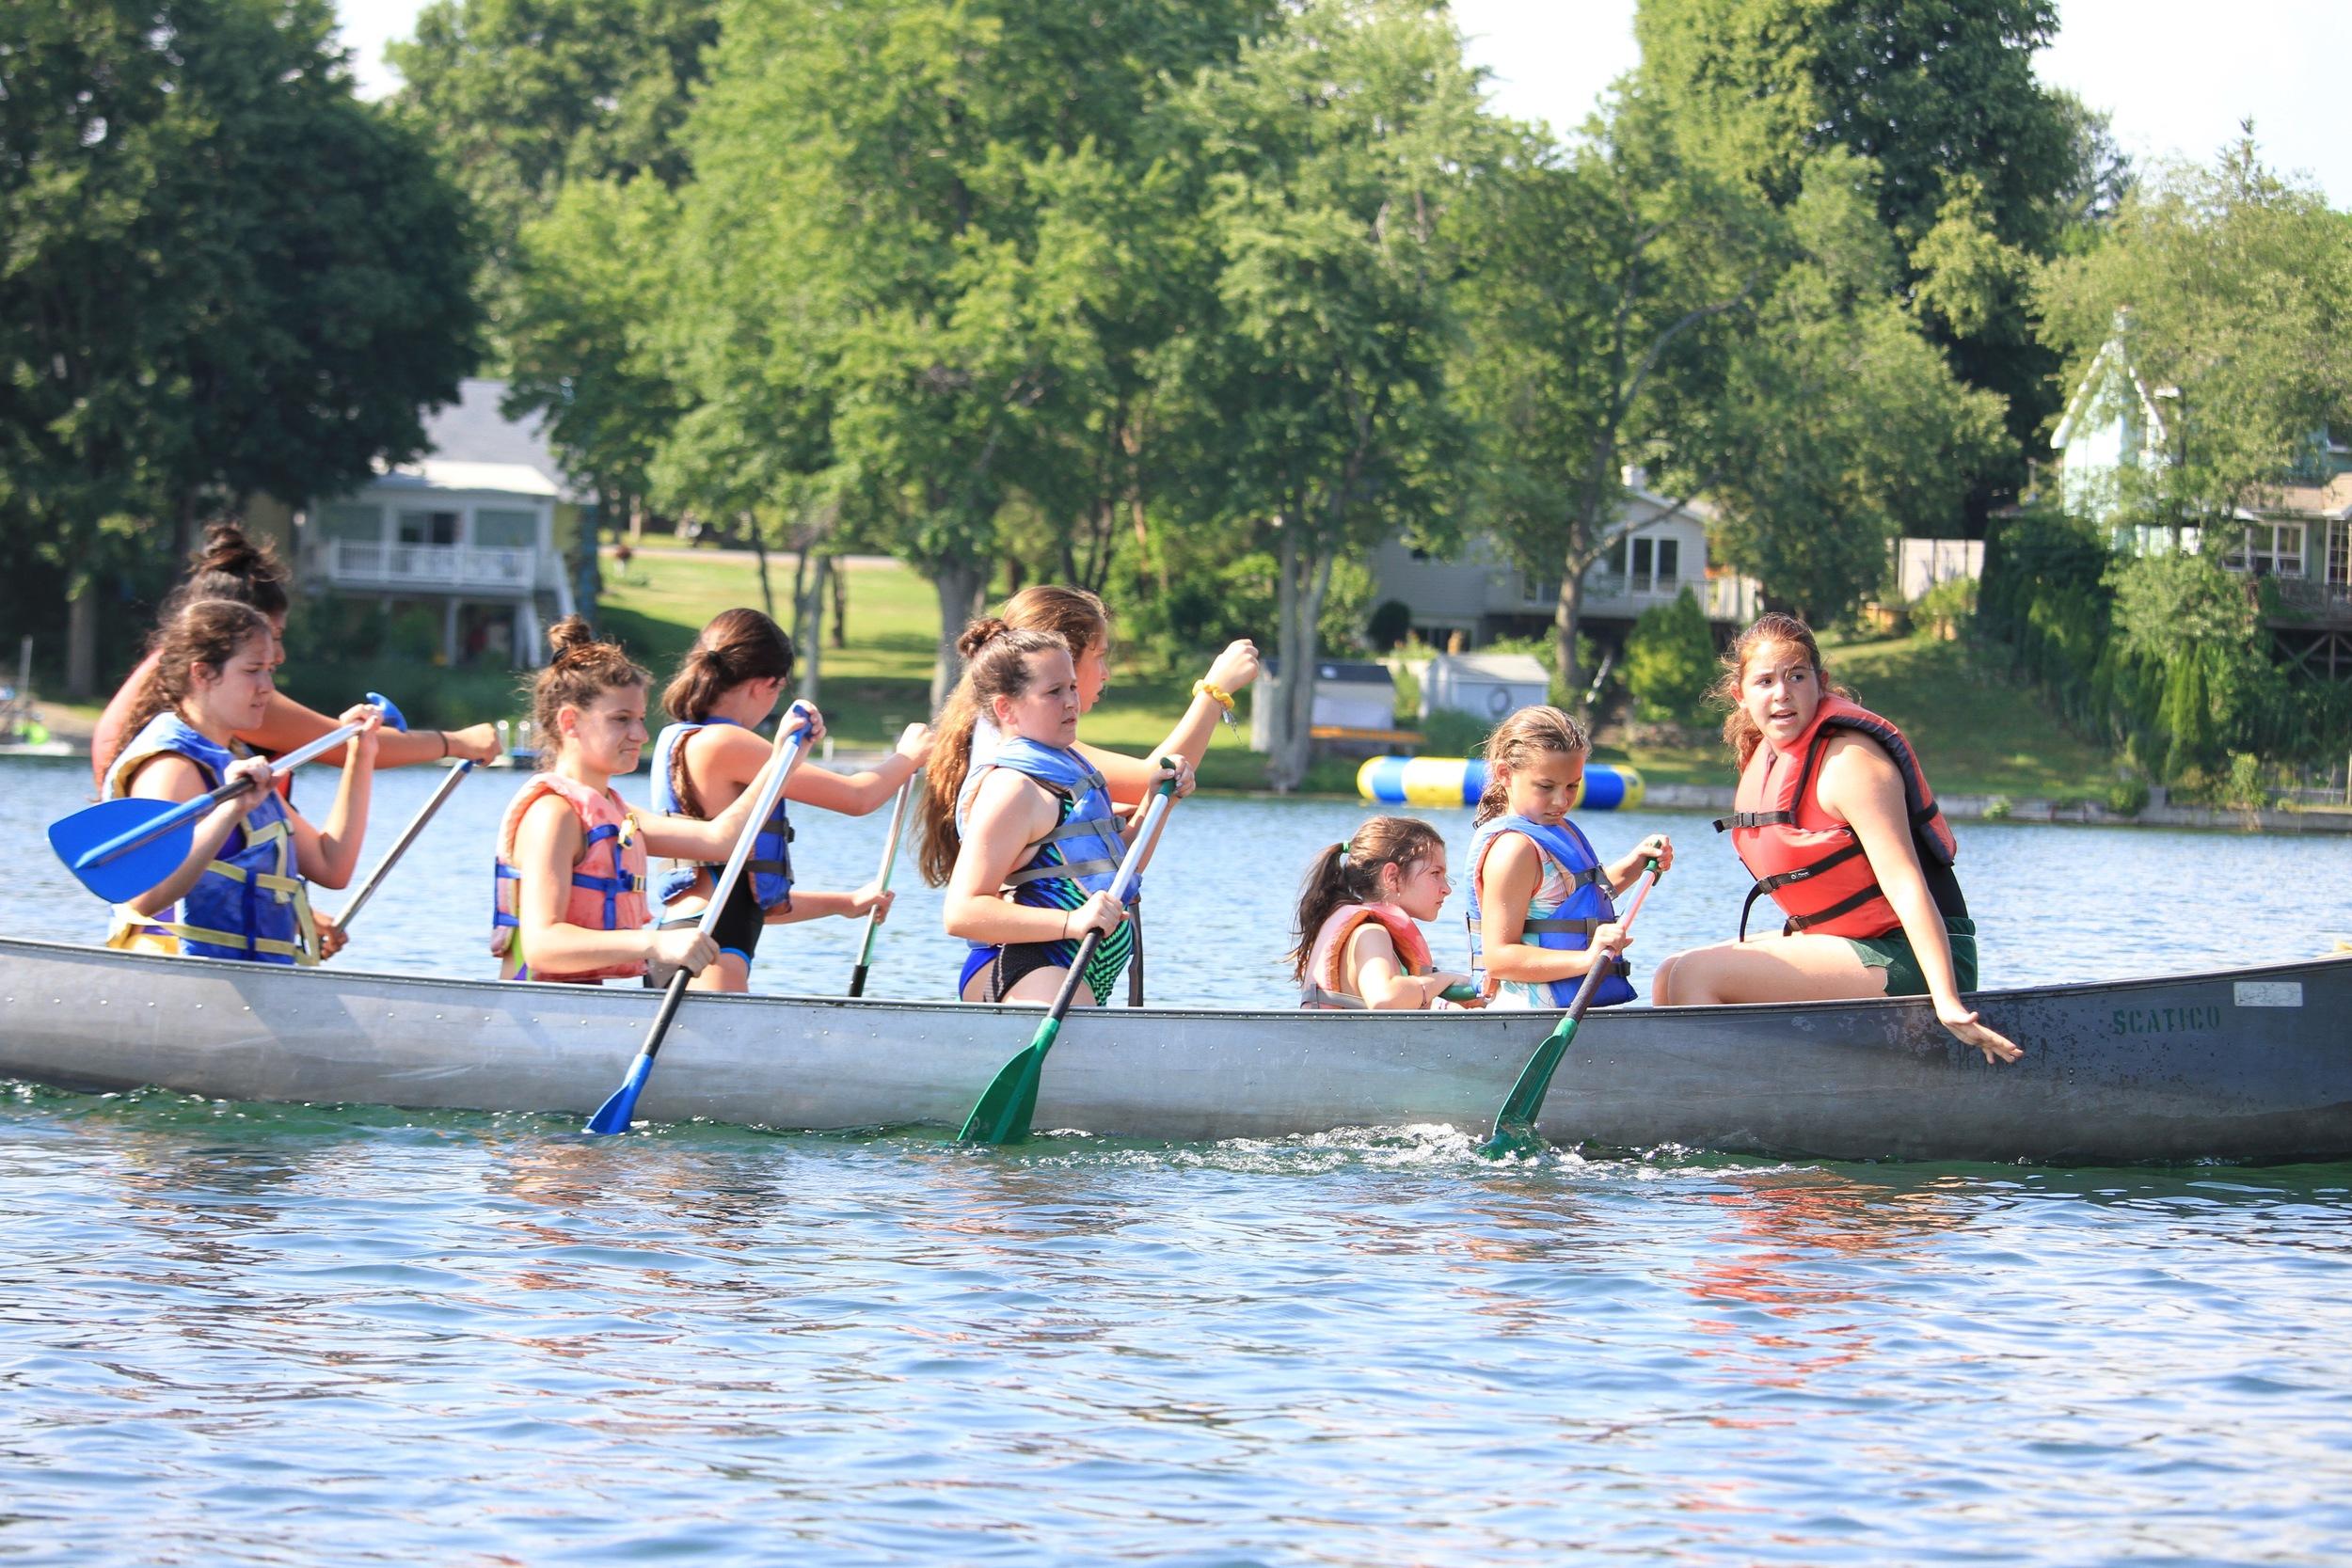 Sooper Anna Rosenfeld leads a all-division War Canoe during the Tribes' Swim Meet